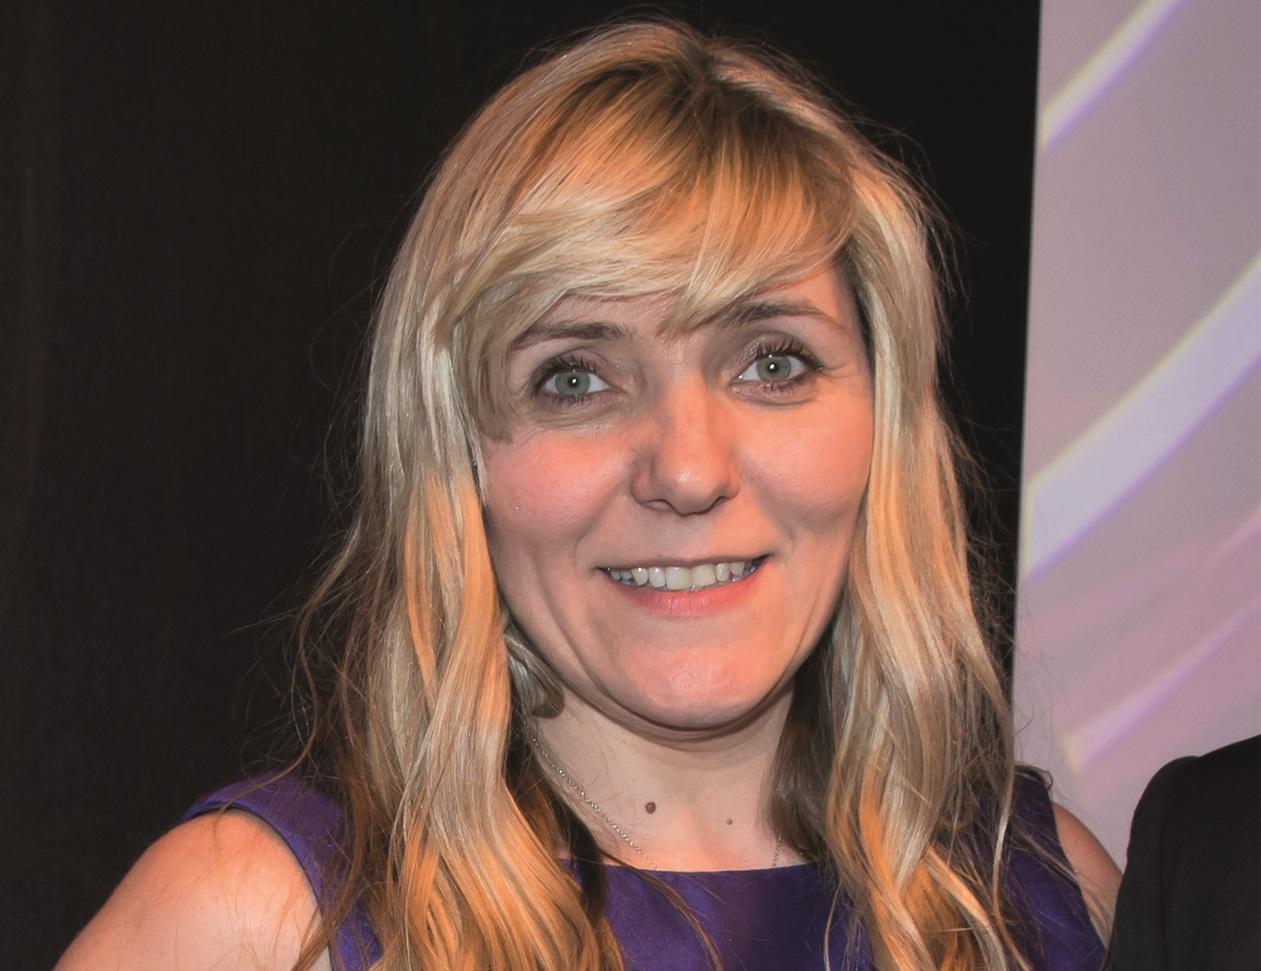 12. Jennifer Paice – Chief executive of SafeDeposits Scotland